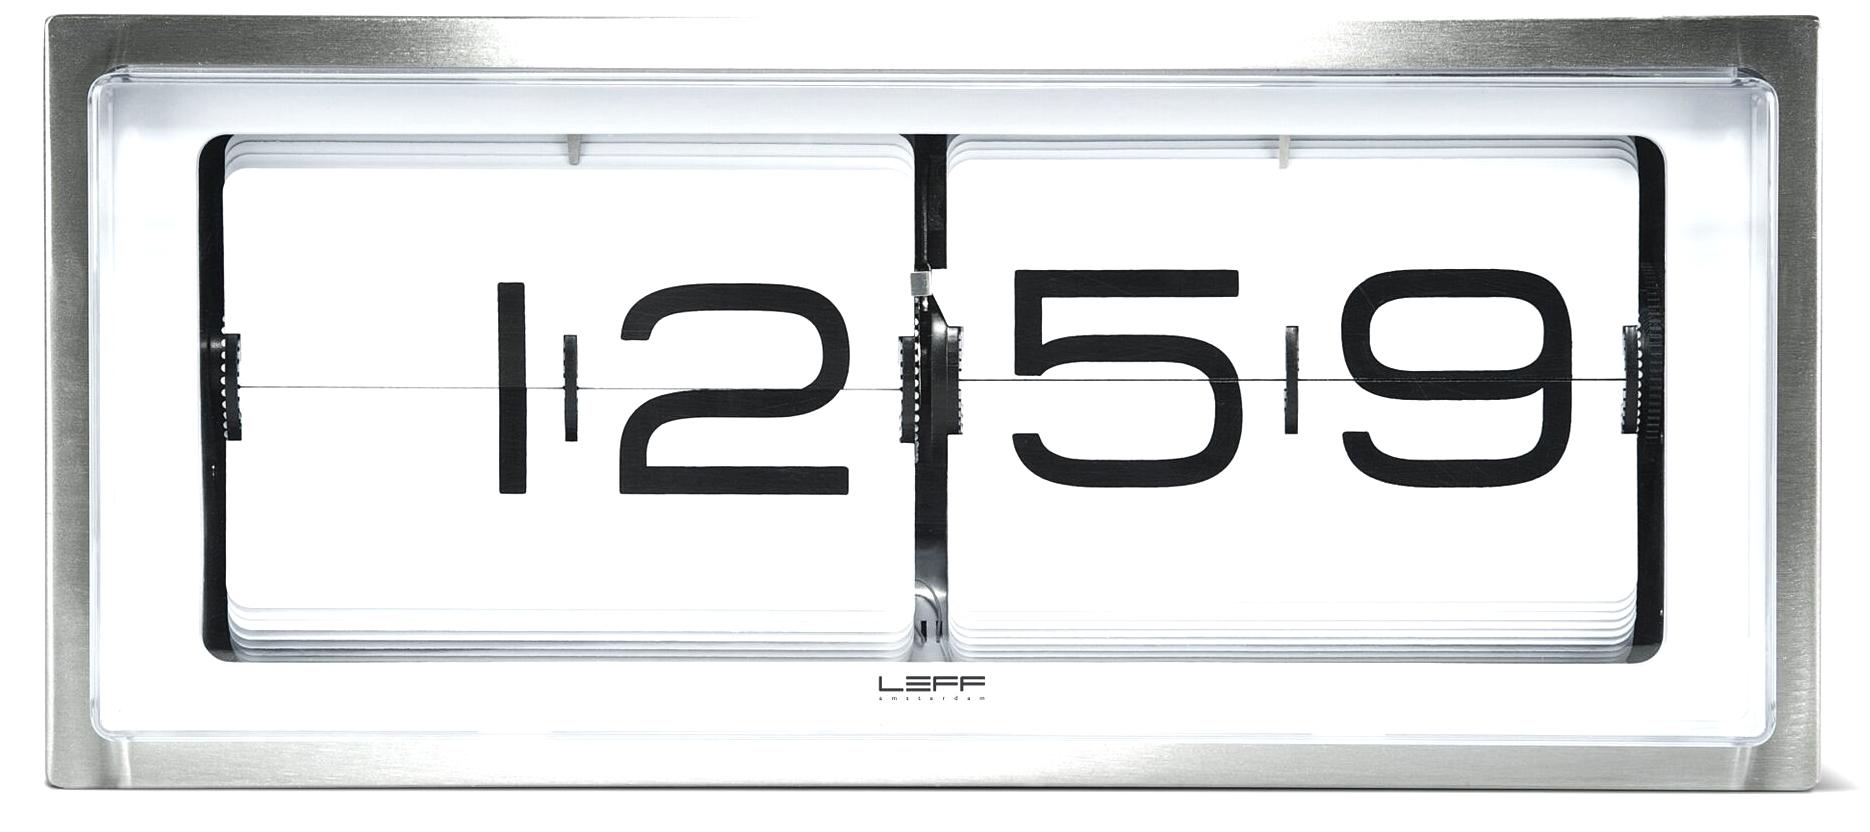 wanduhr tischuhr leff amsterdam brick24 lt15001 g nstig. Black Bedroom Furniture Sets. Home Design Ideas